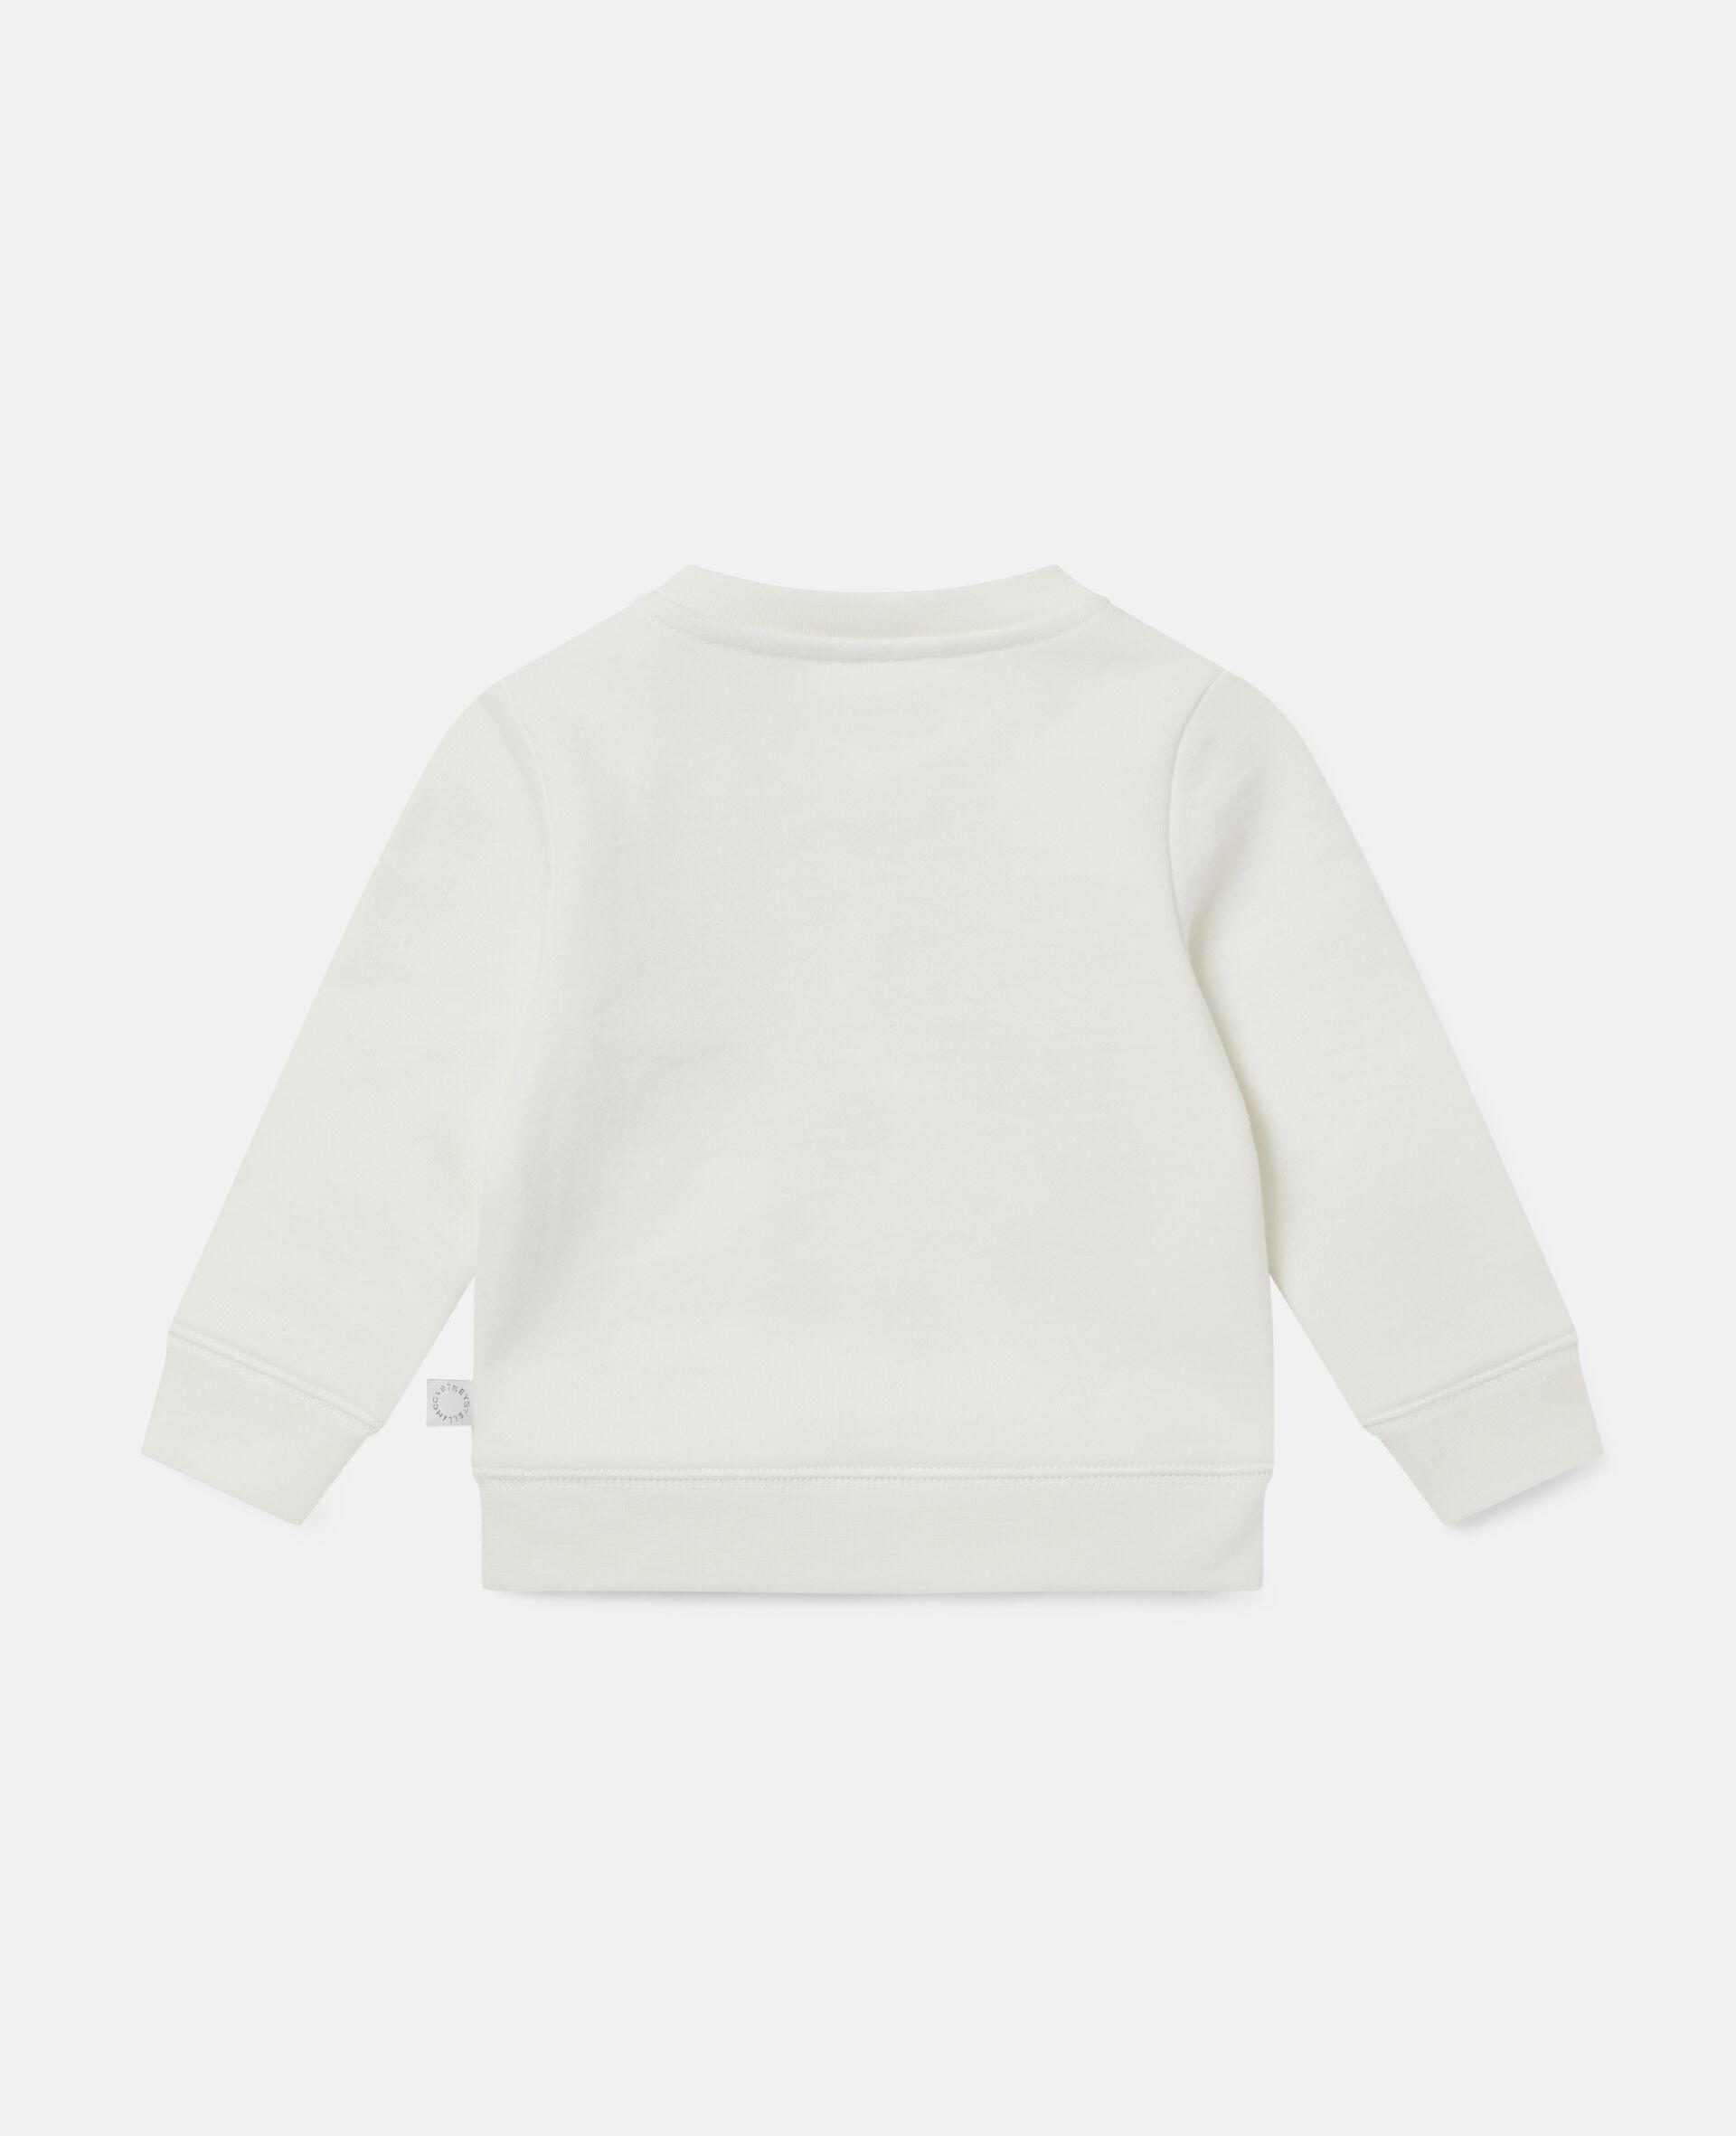 Dalmatian Sports Fleece Sweatshirt-White-large image number 3